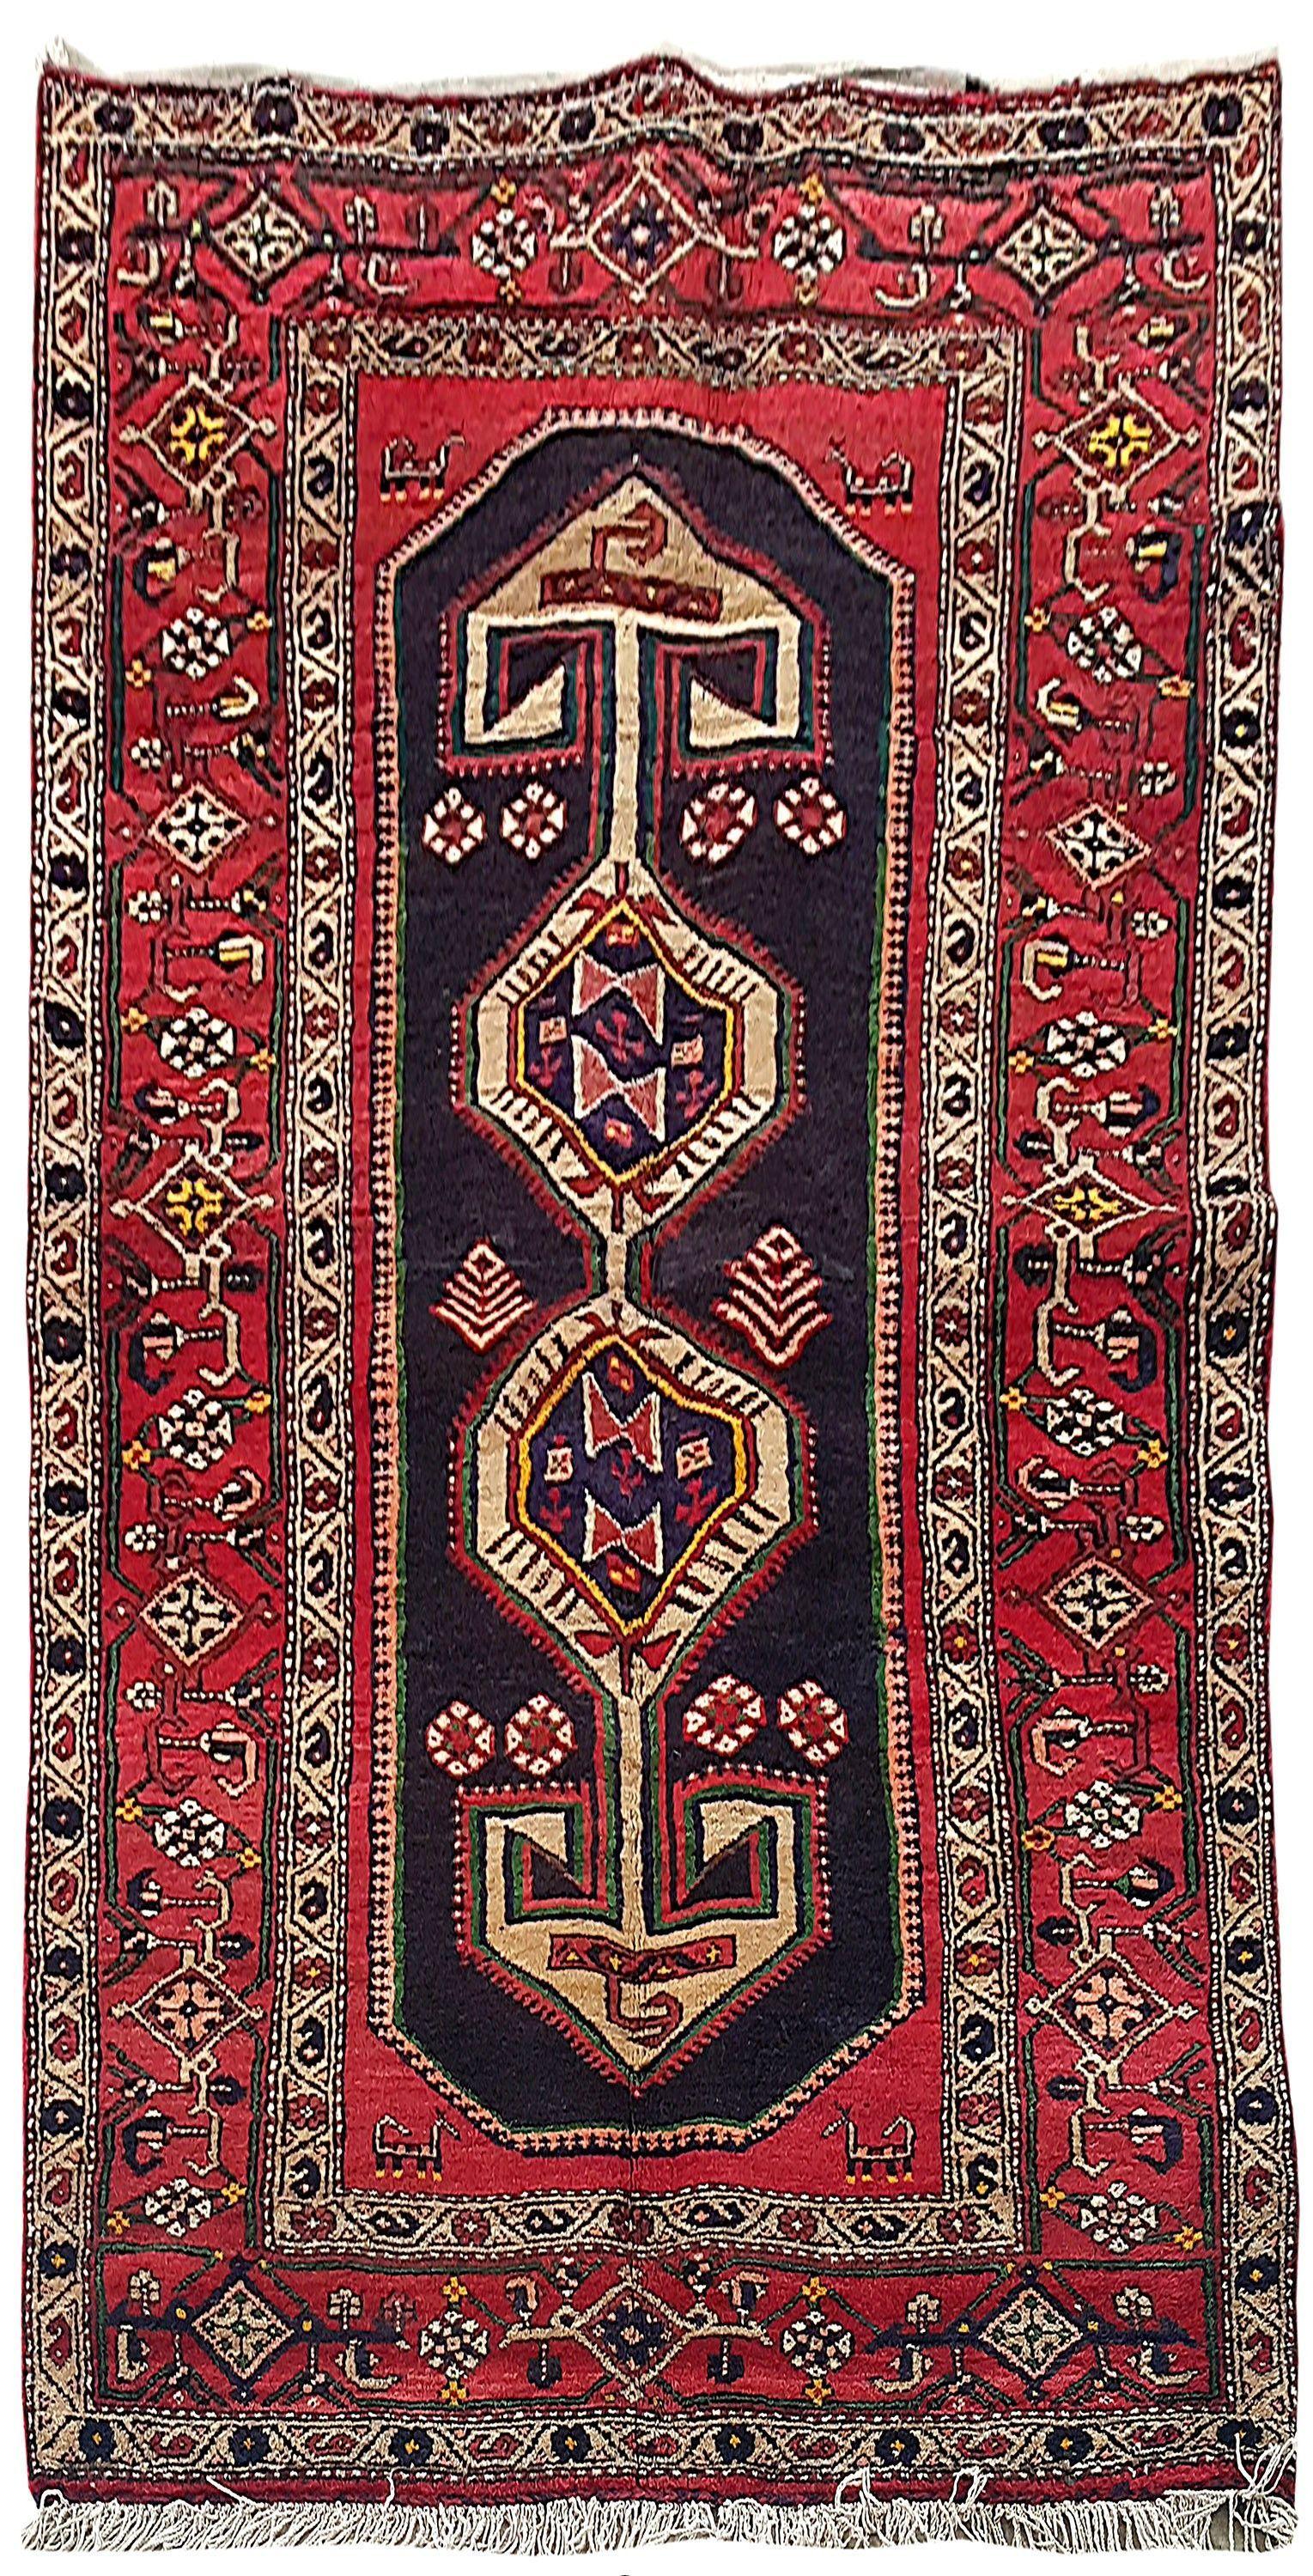 Handmade Rug 4 X 8 Persian Hamadan Made Of Wool Rugs For